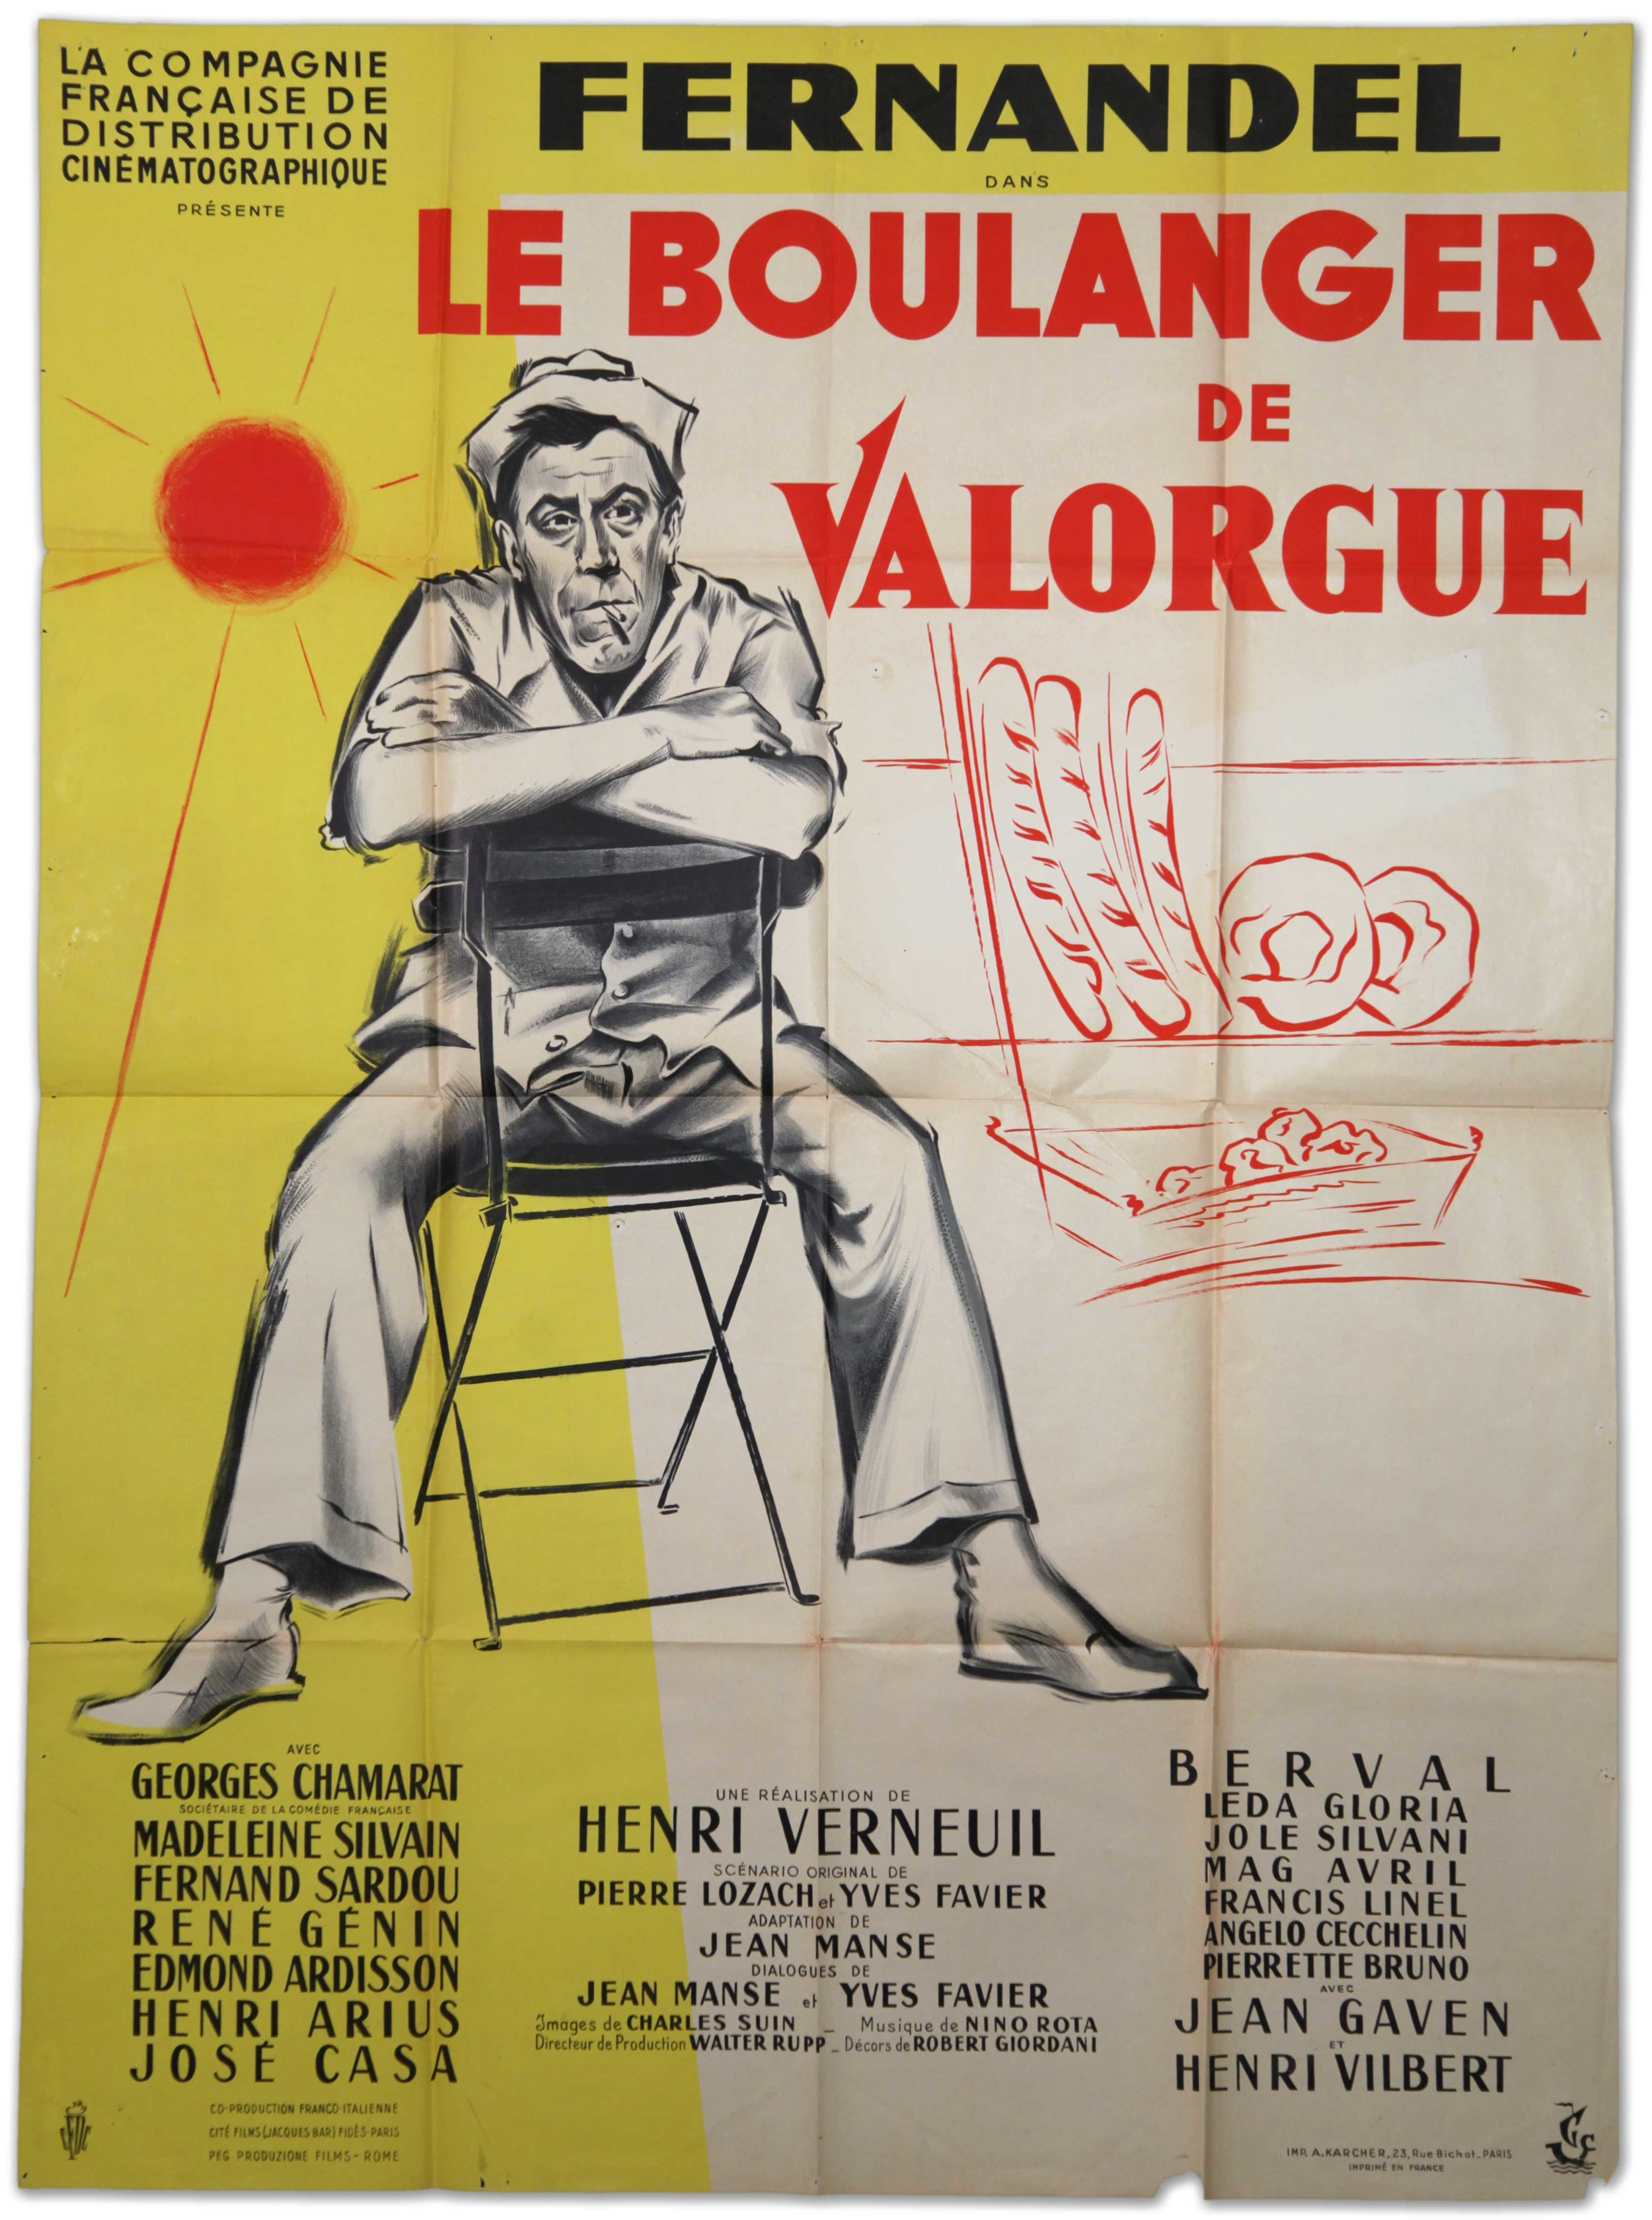 Fernadel in Le Boulanger De Valorue (1953)